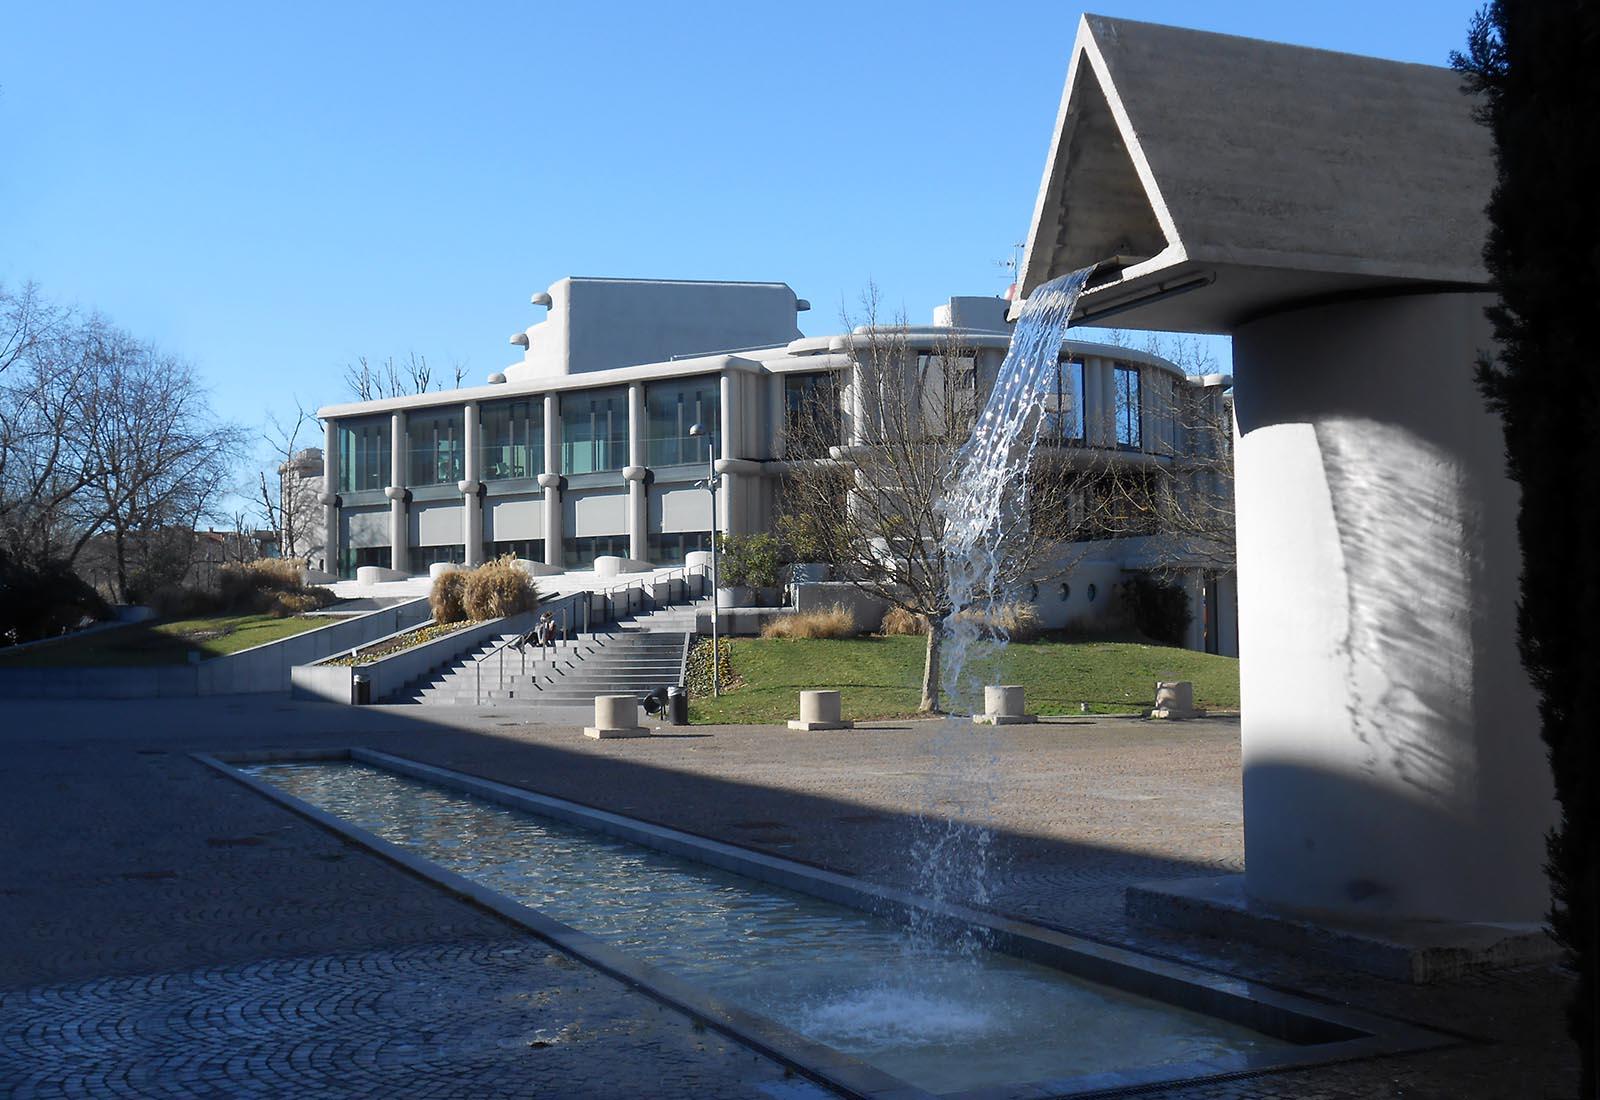 PGT Segrate - La biblioteca comunale